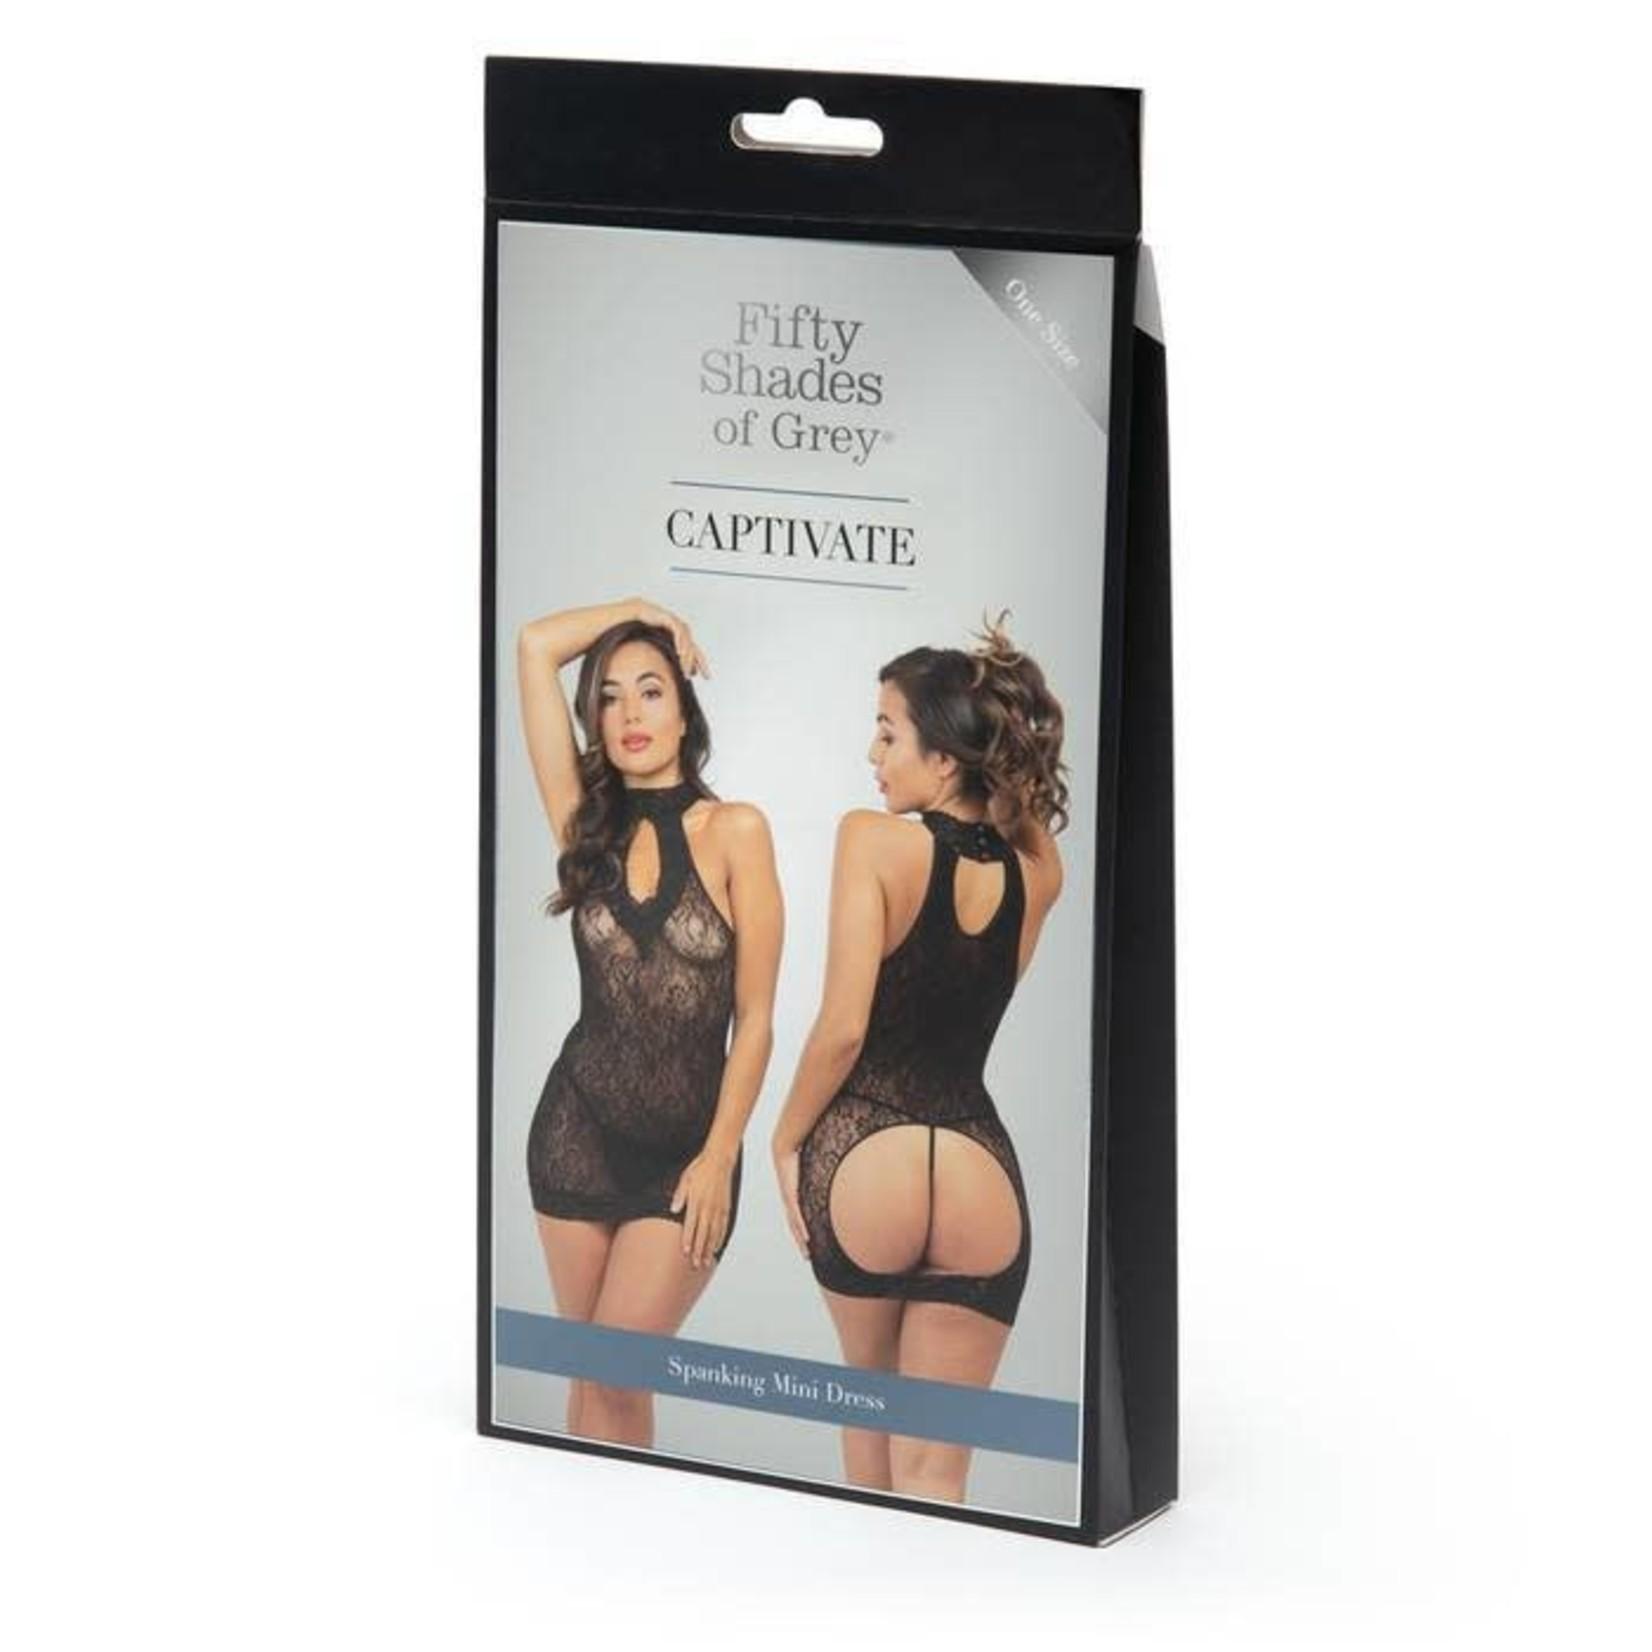 Fifty Shades Of Grey Captivate Spanking Mini Dress OS